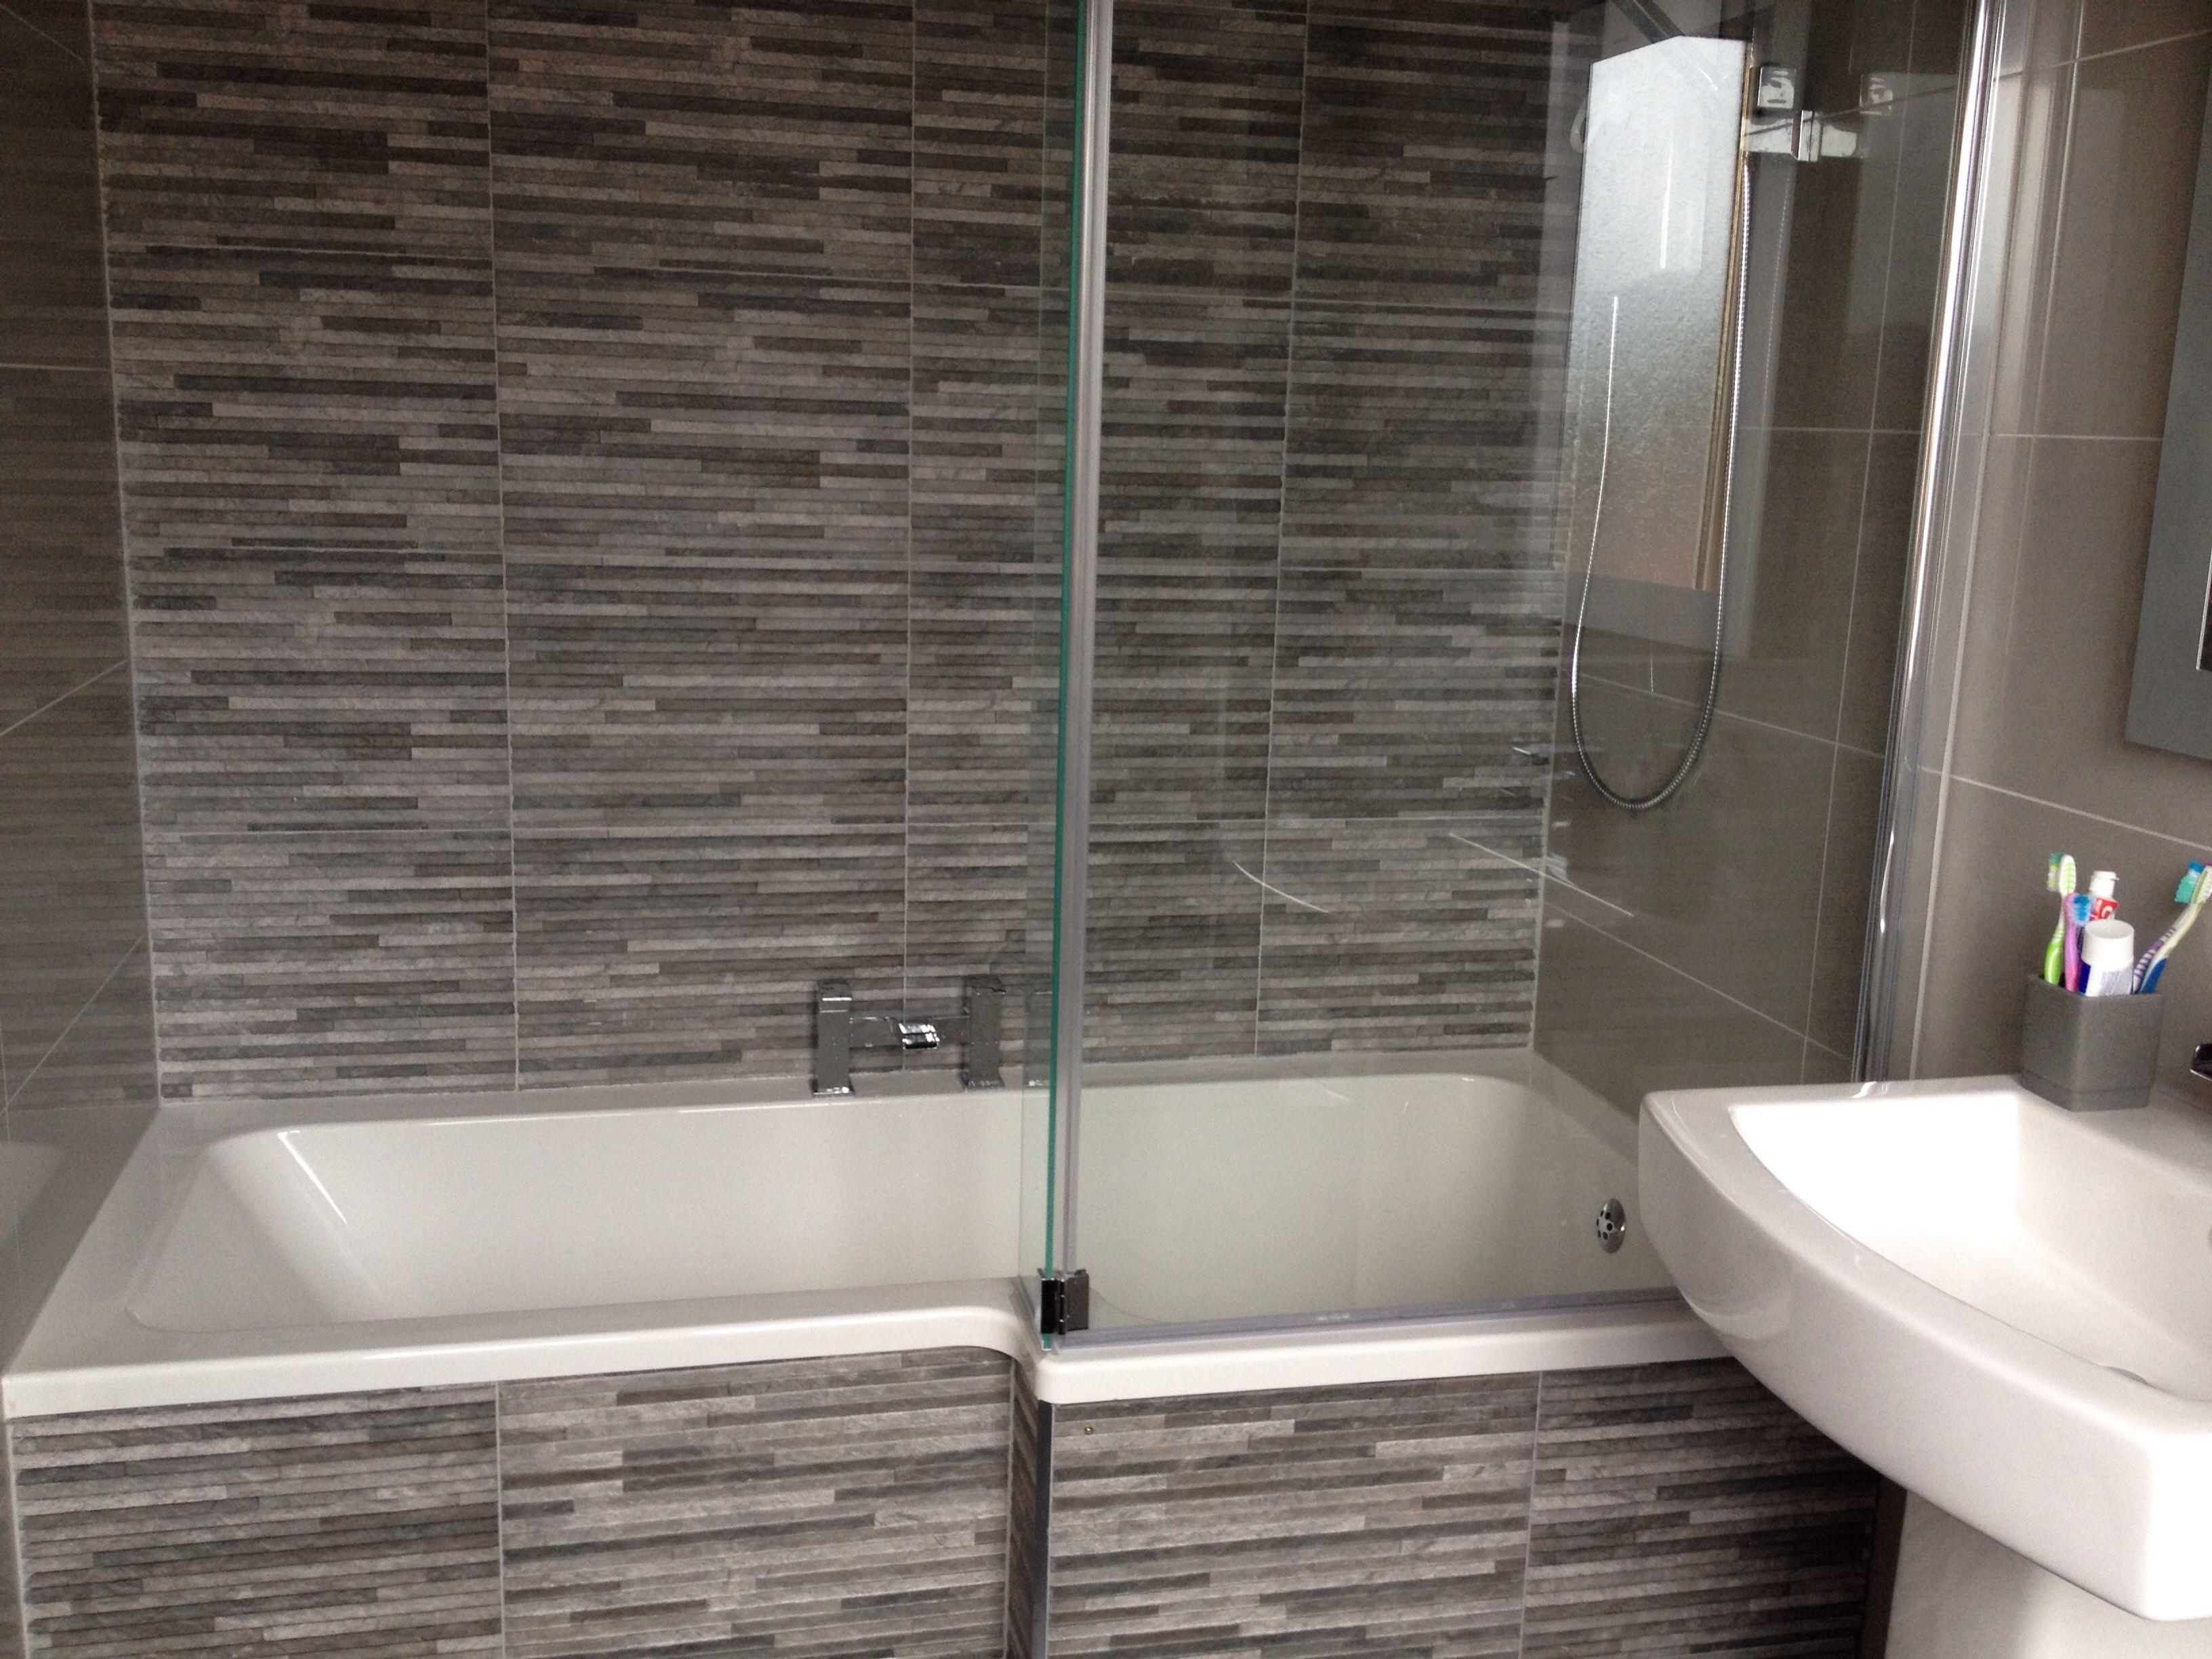 L Shaped Bath Screen Tiles Bathroom Design Simple Bathroom